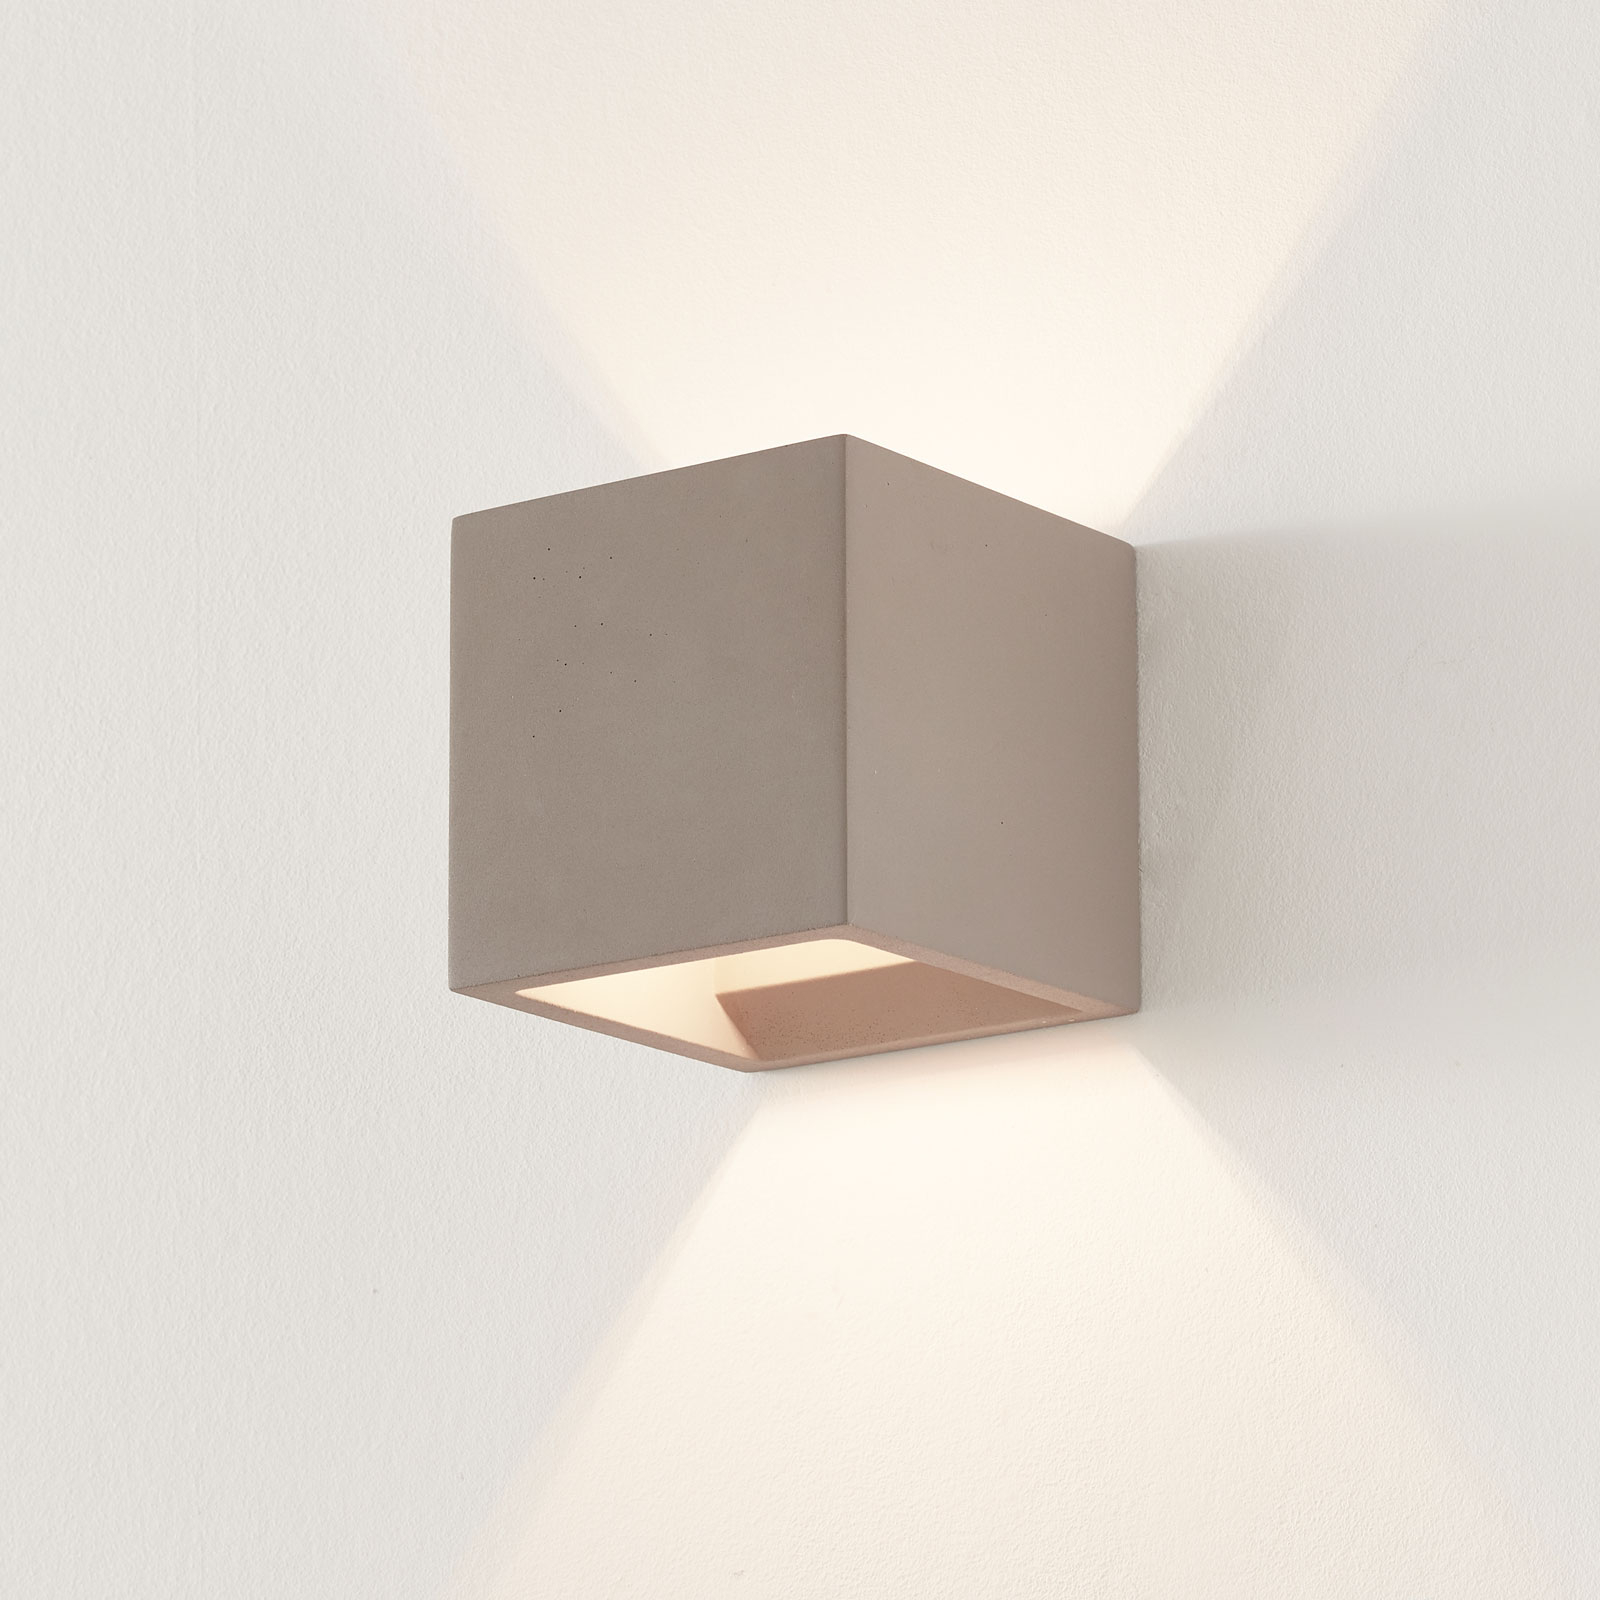 Beton-Wandlampe Jayden in eckiger Form